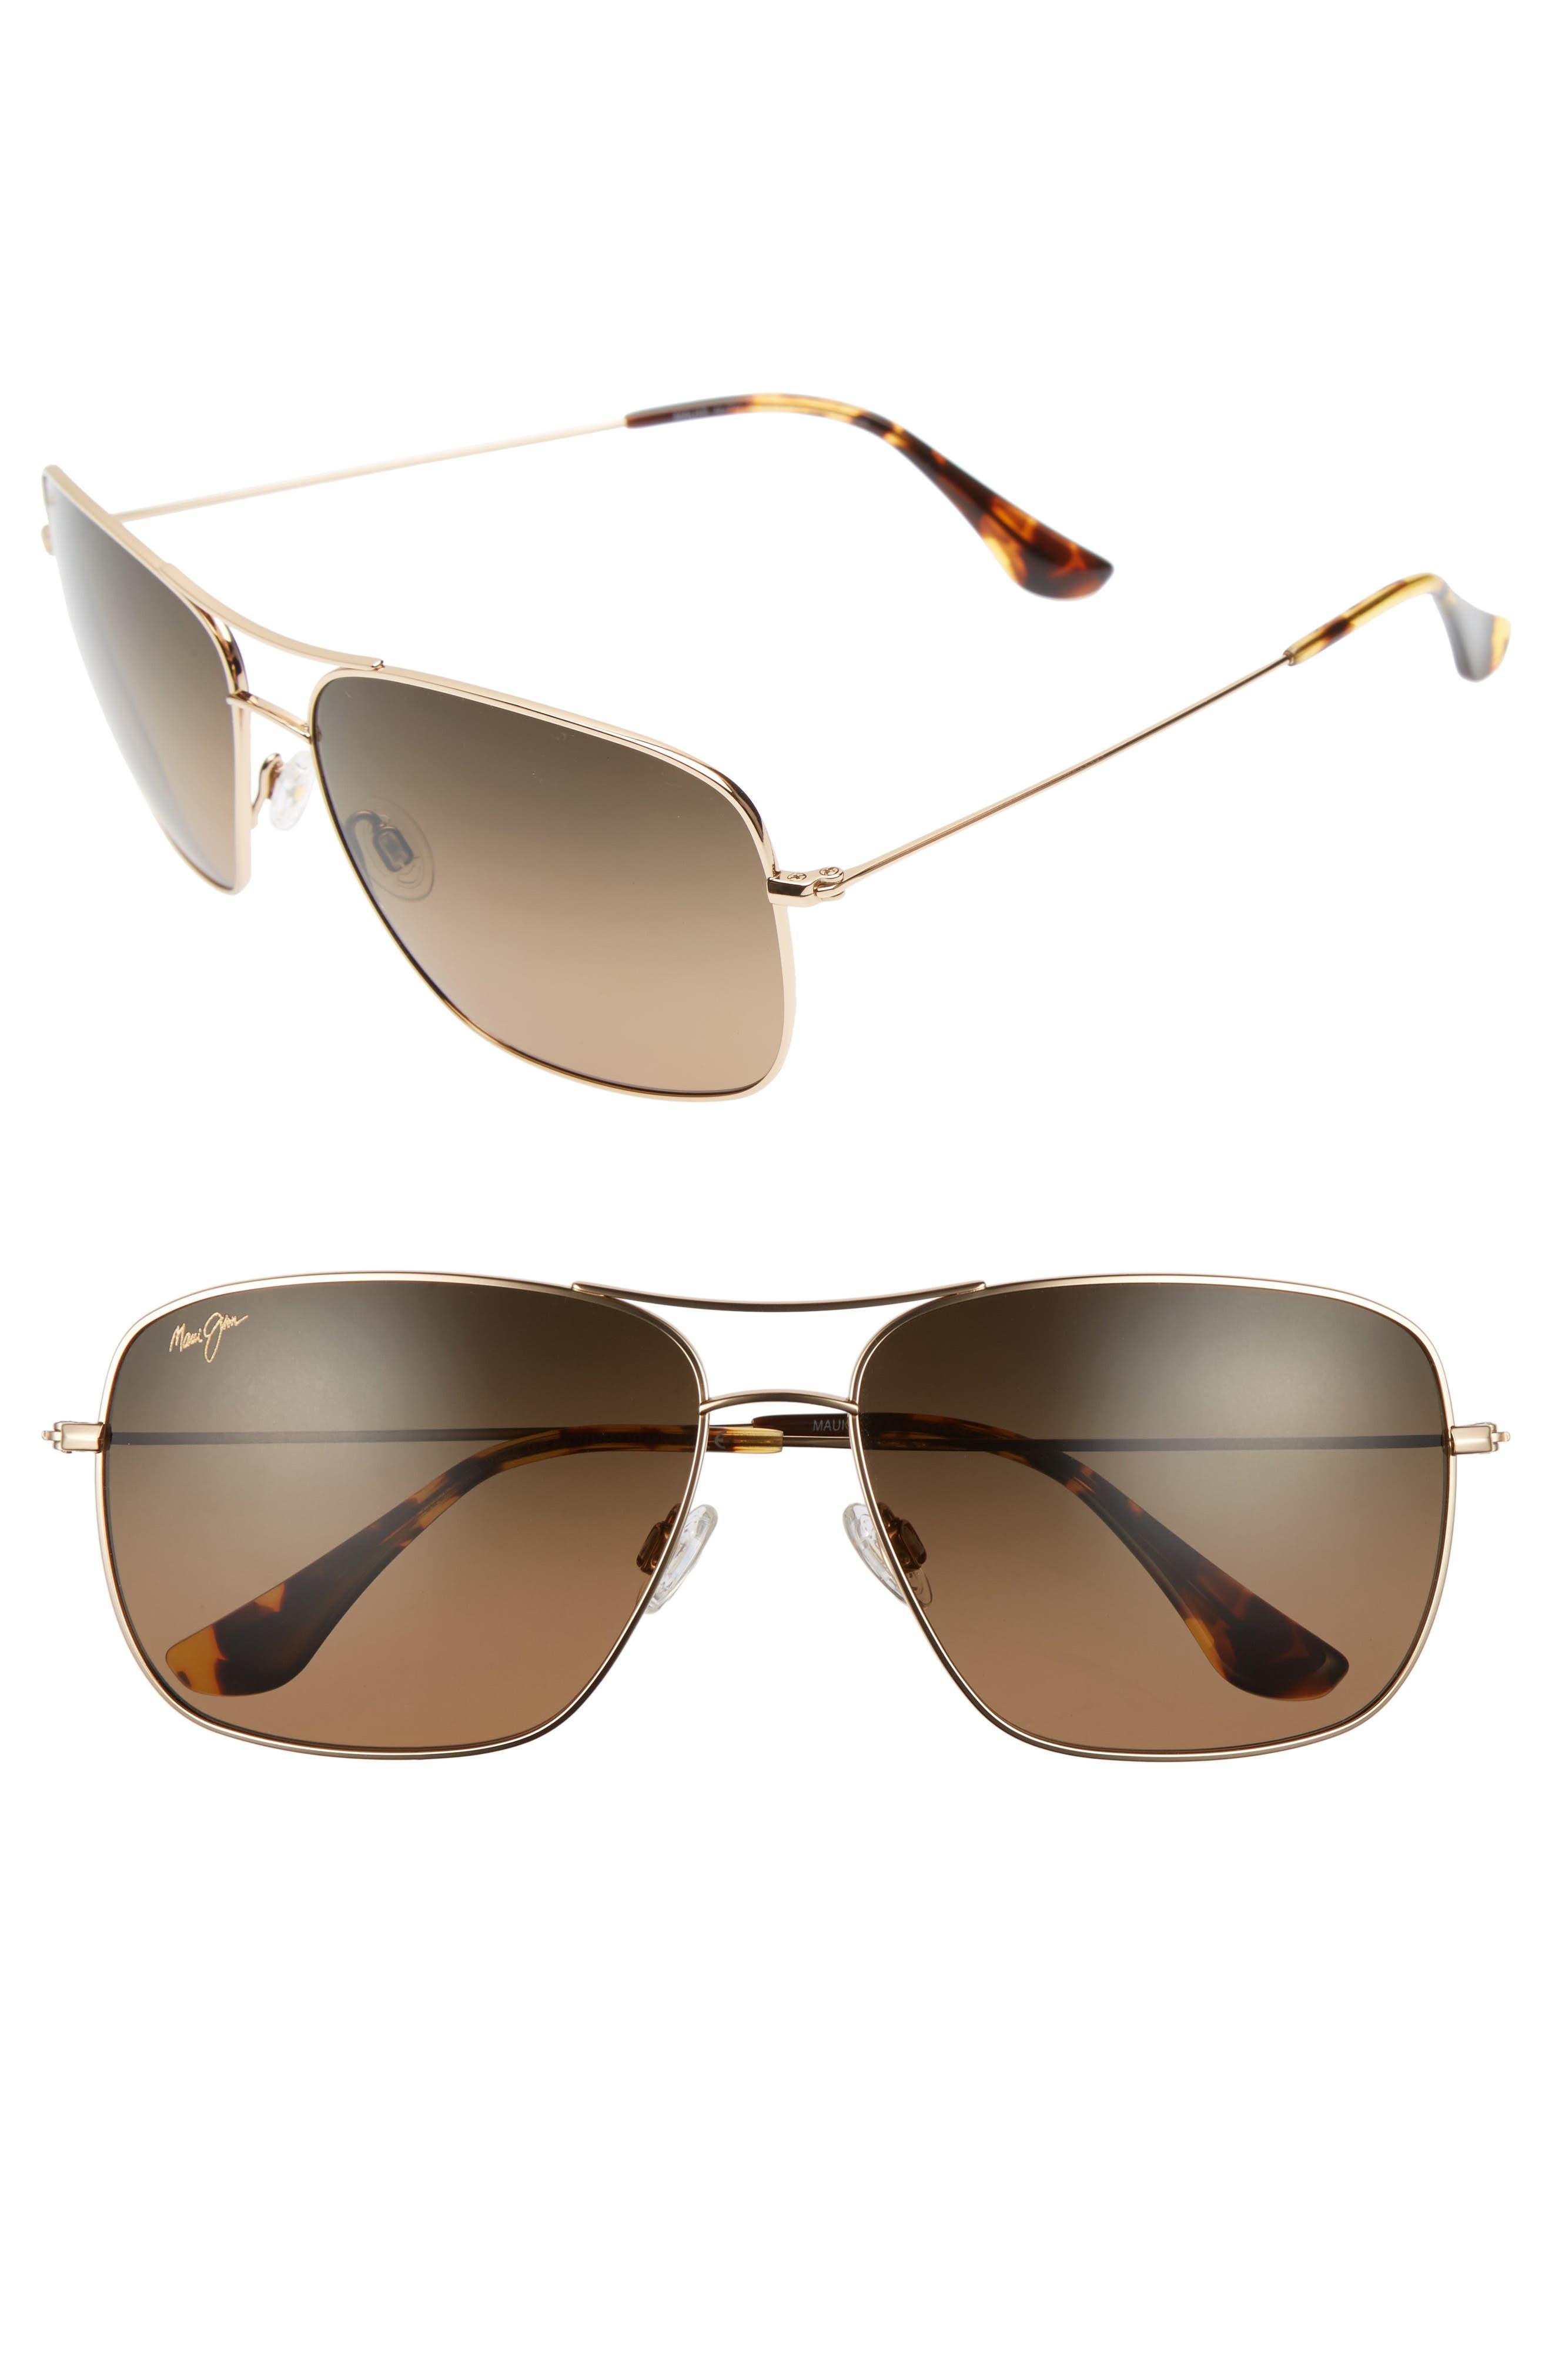 Cook Pines 63mm Polarized Titanium Aviator Sunglasses,                             Main thumbnail 4, color,